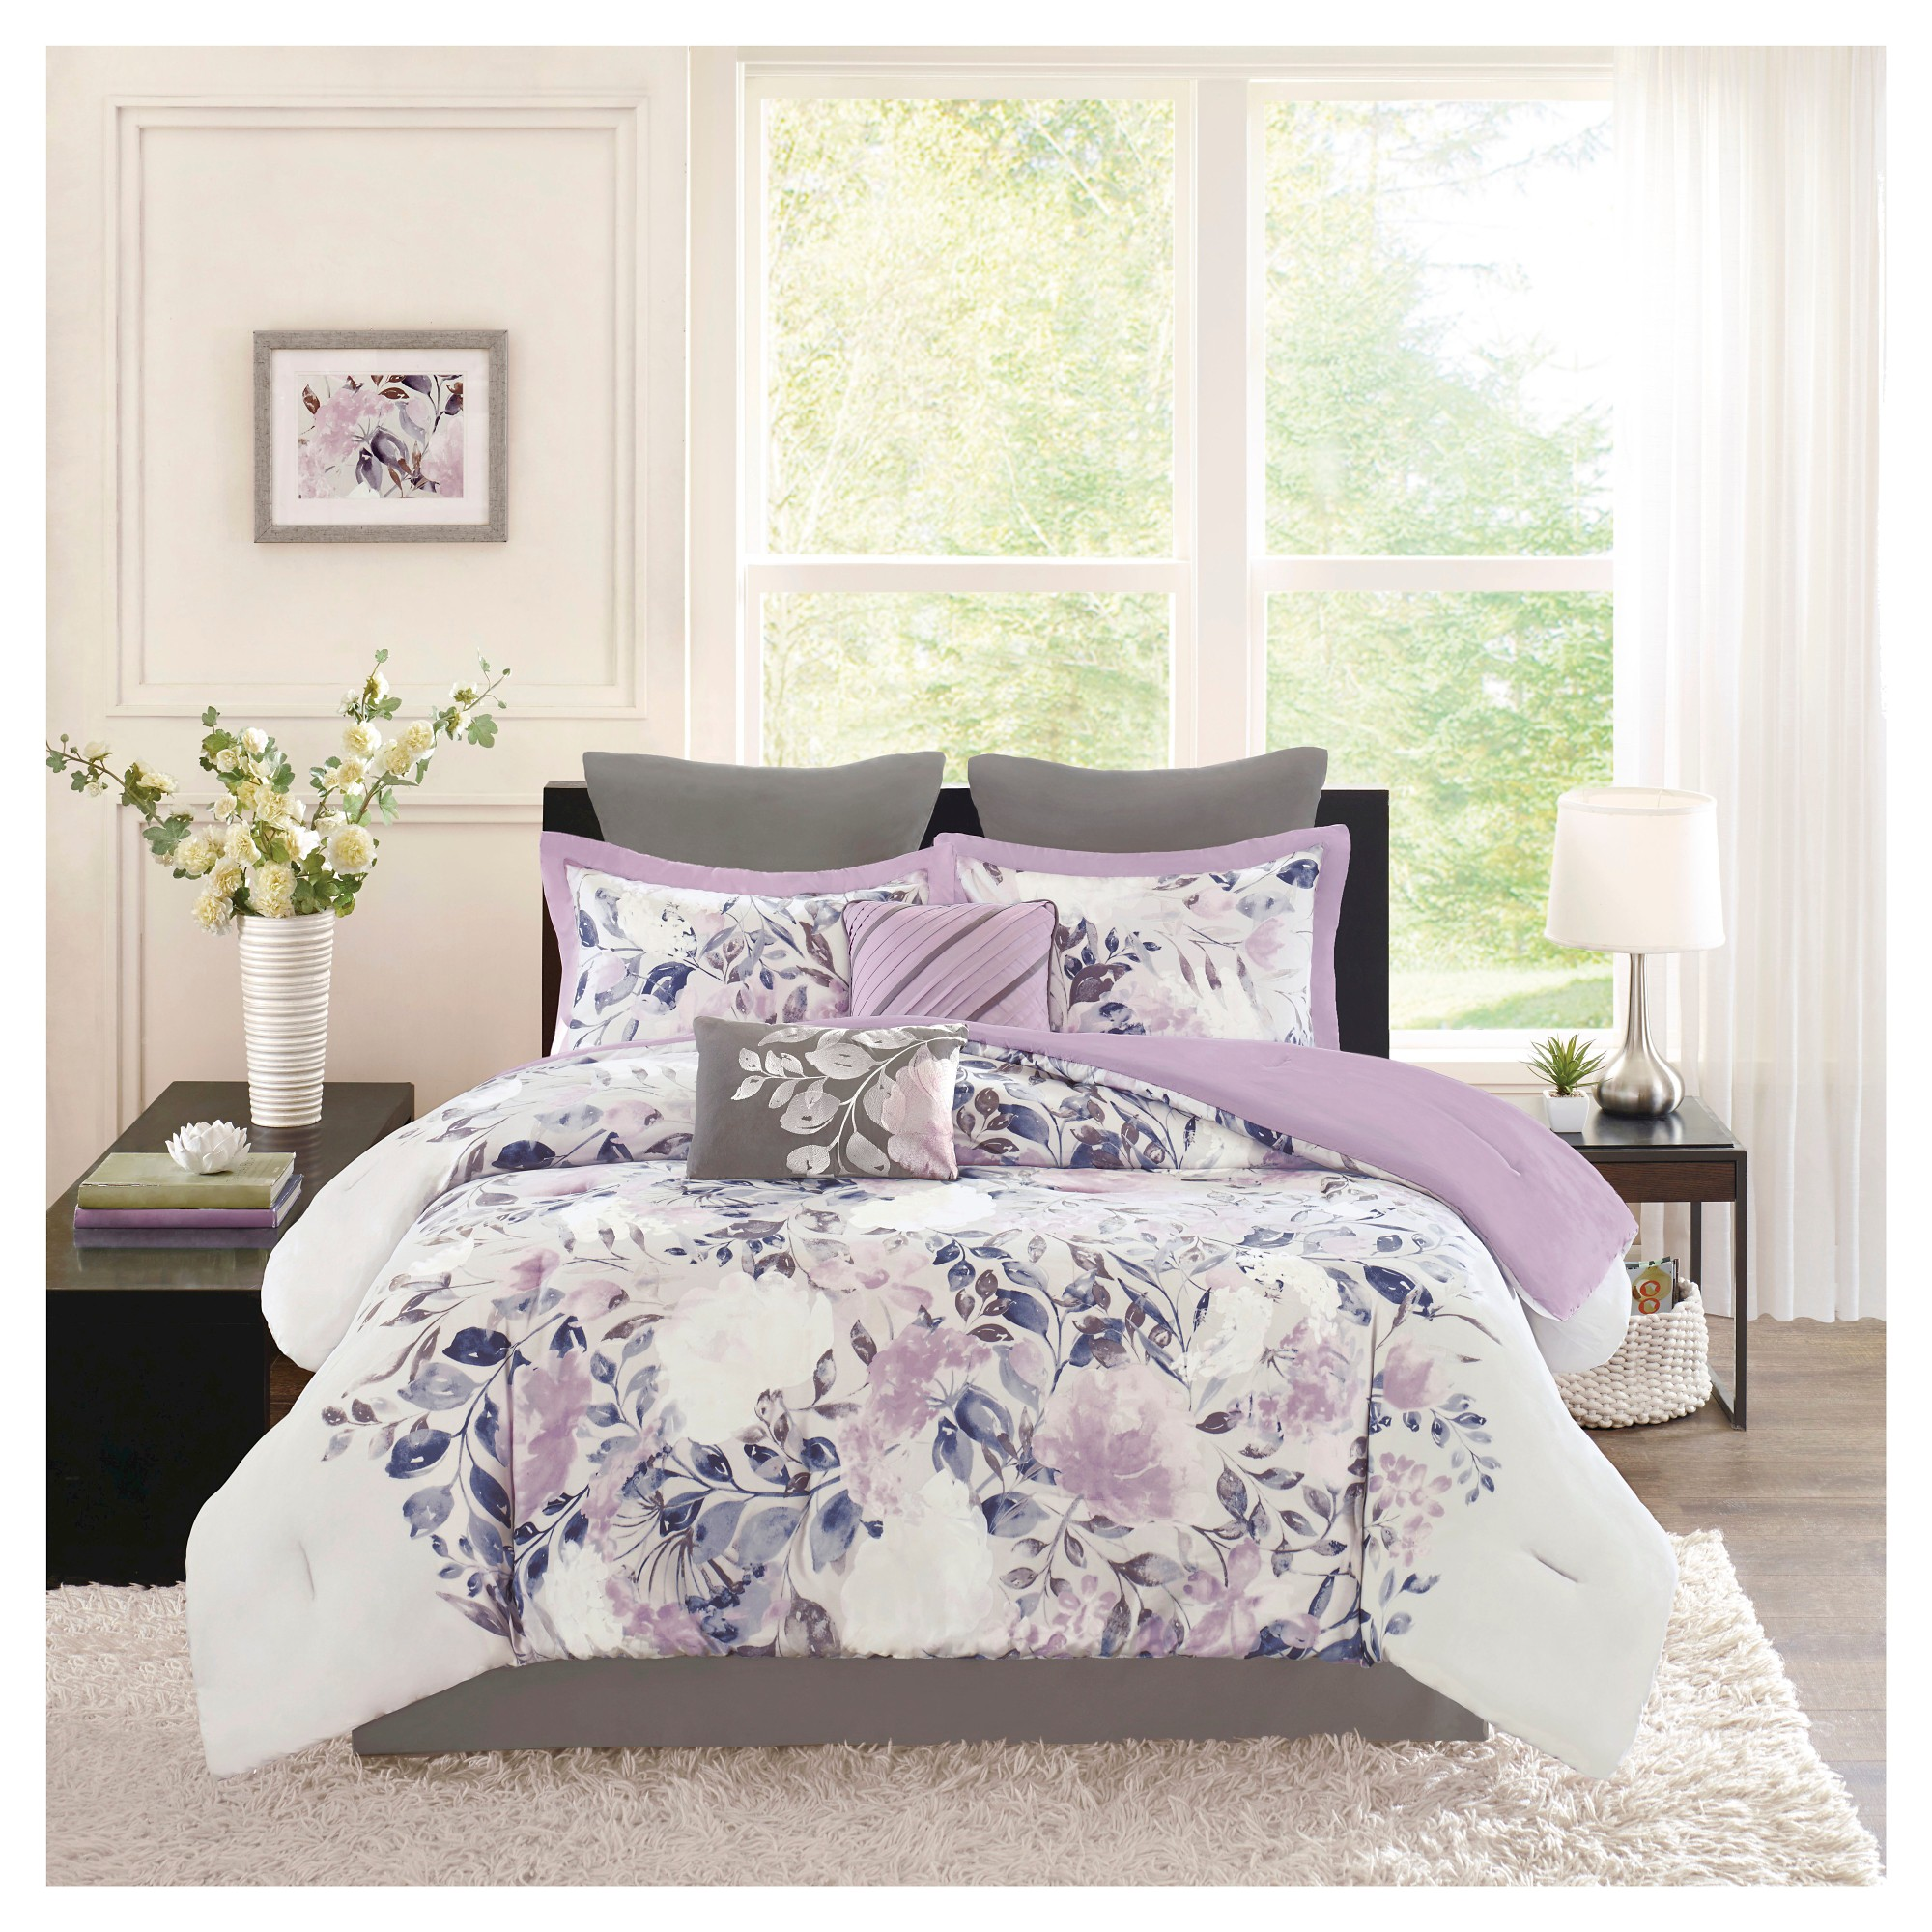 p queen the purple lavish bedding comforter home q piece aria sets set